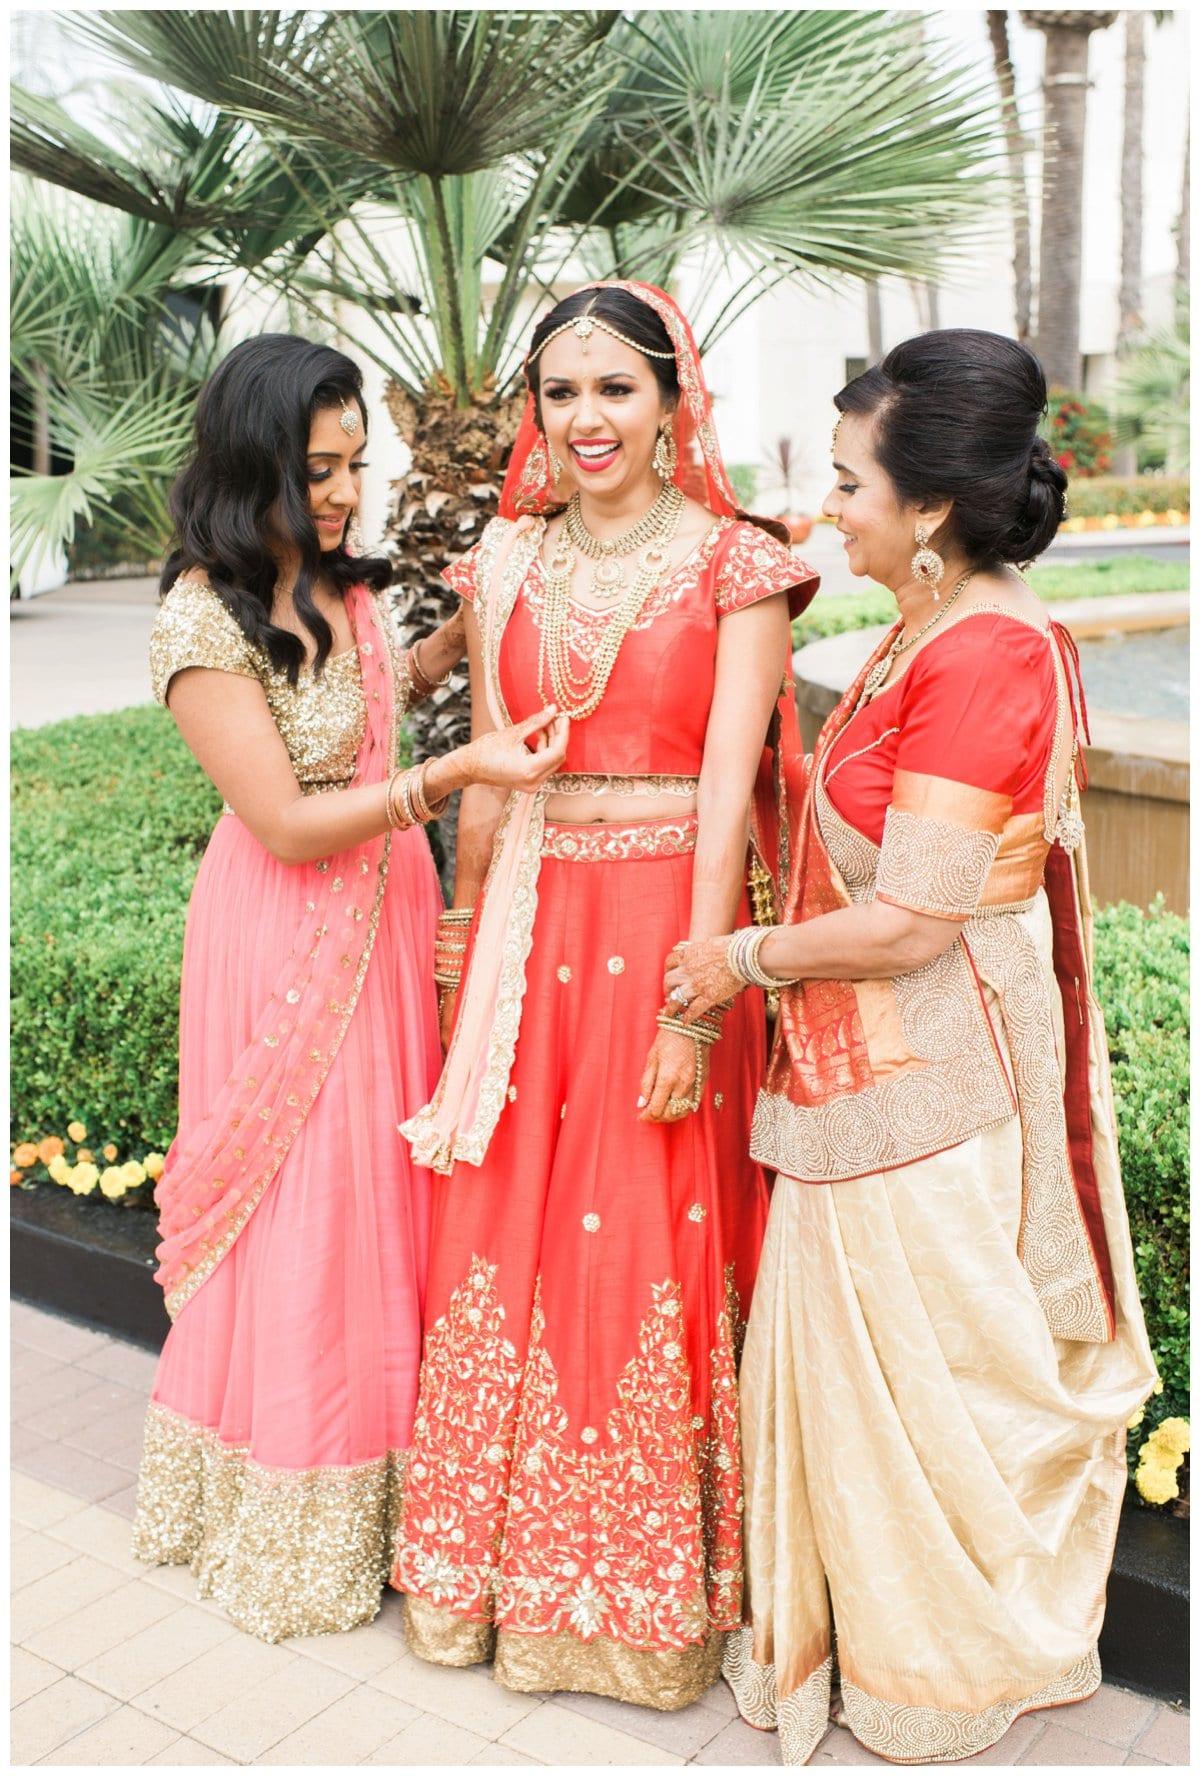 Hotel-Irvine-Indian-Wedding-Carissa-Woo-Photography_0008.jpg